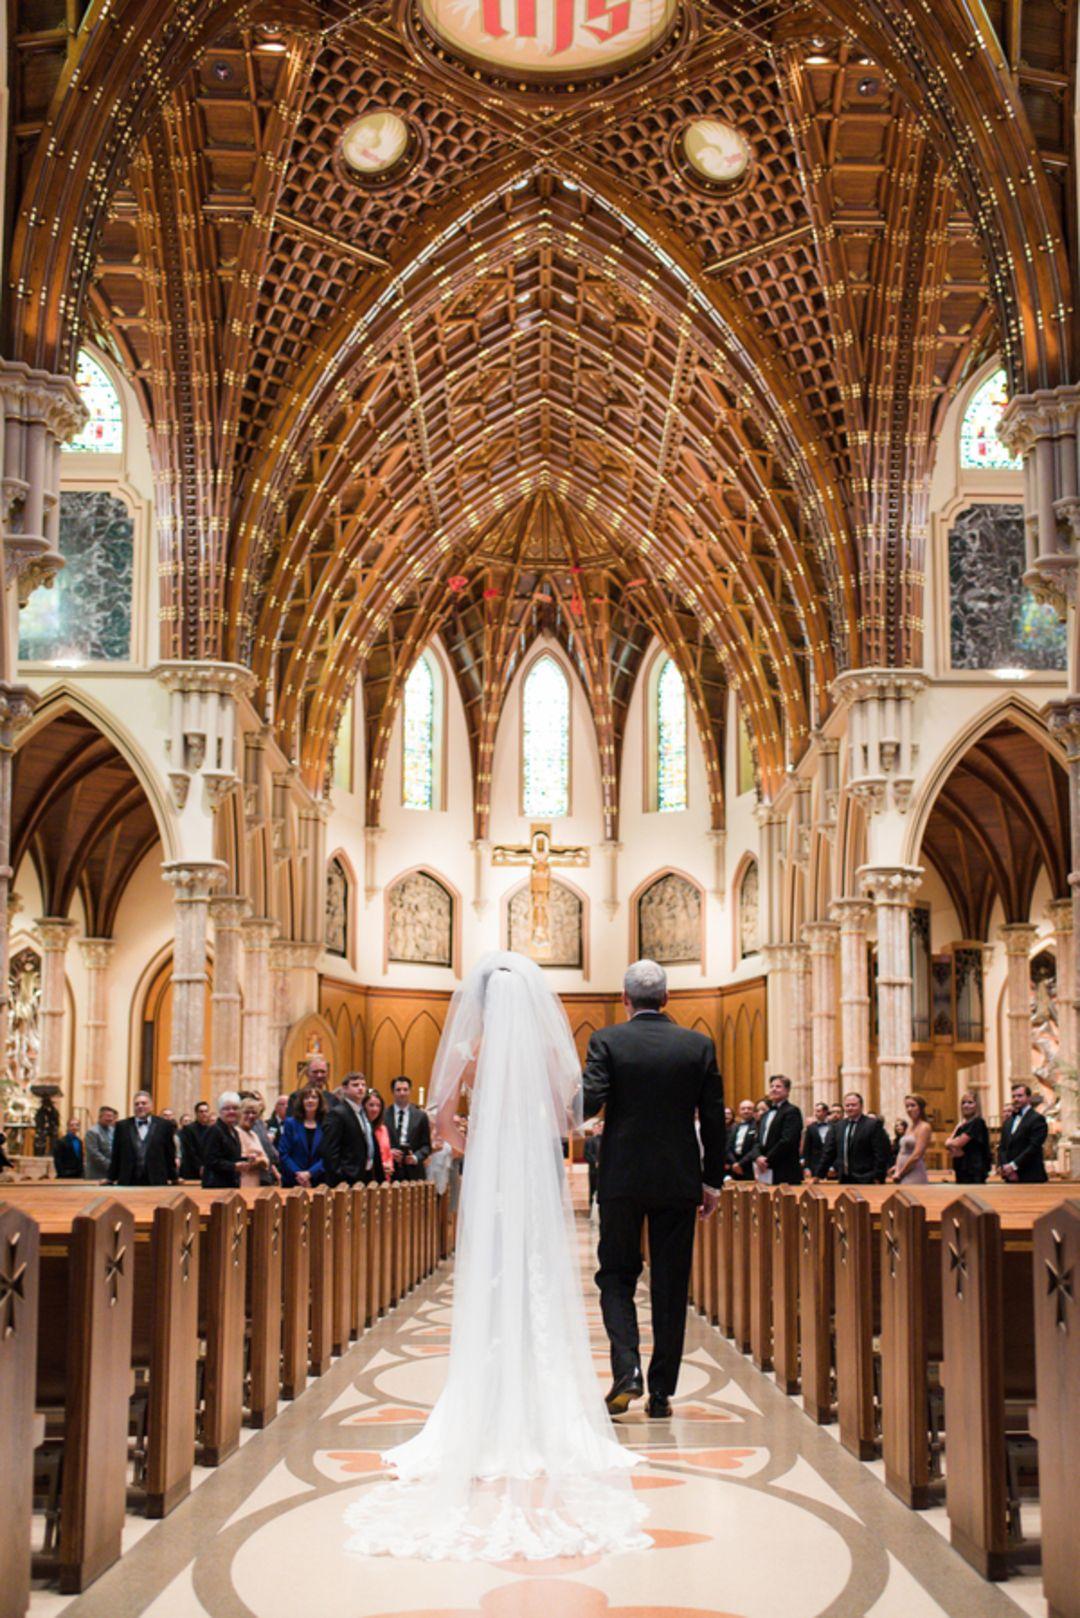 Wedding Vendors Glamorous Wedding Wedding Officiant Script Wedding Venue Inspiration